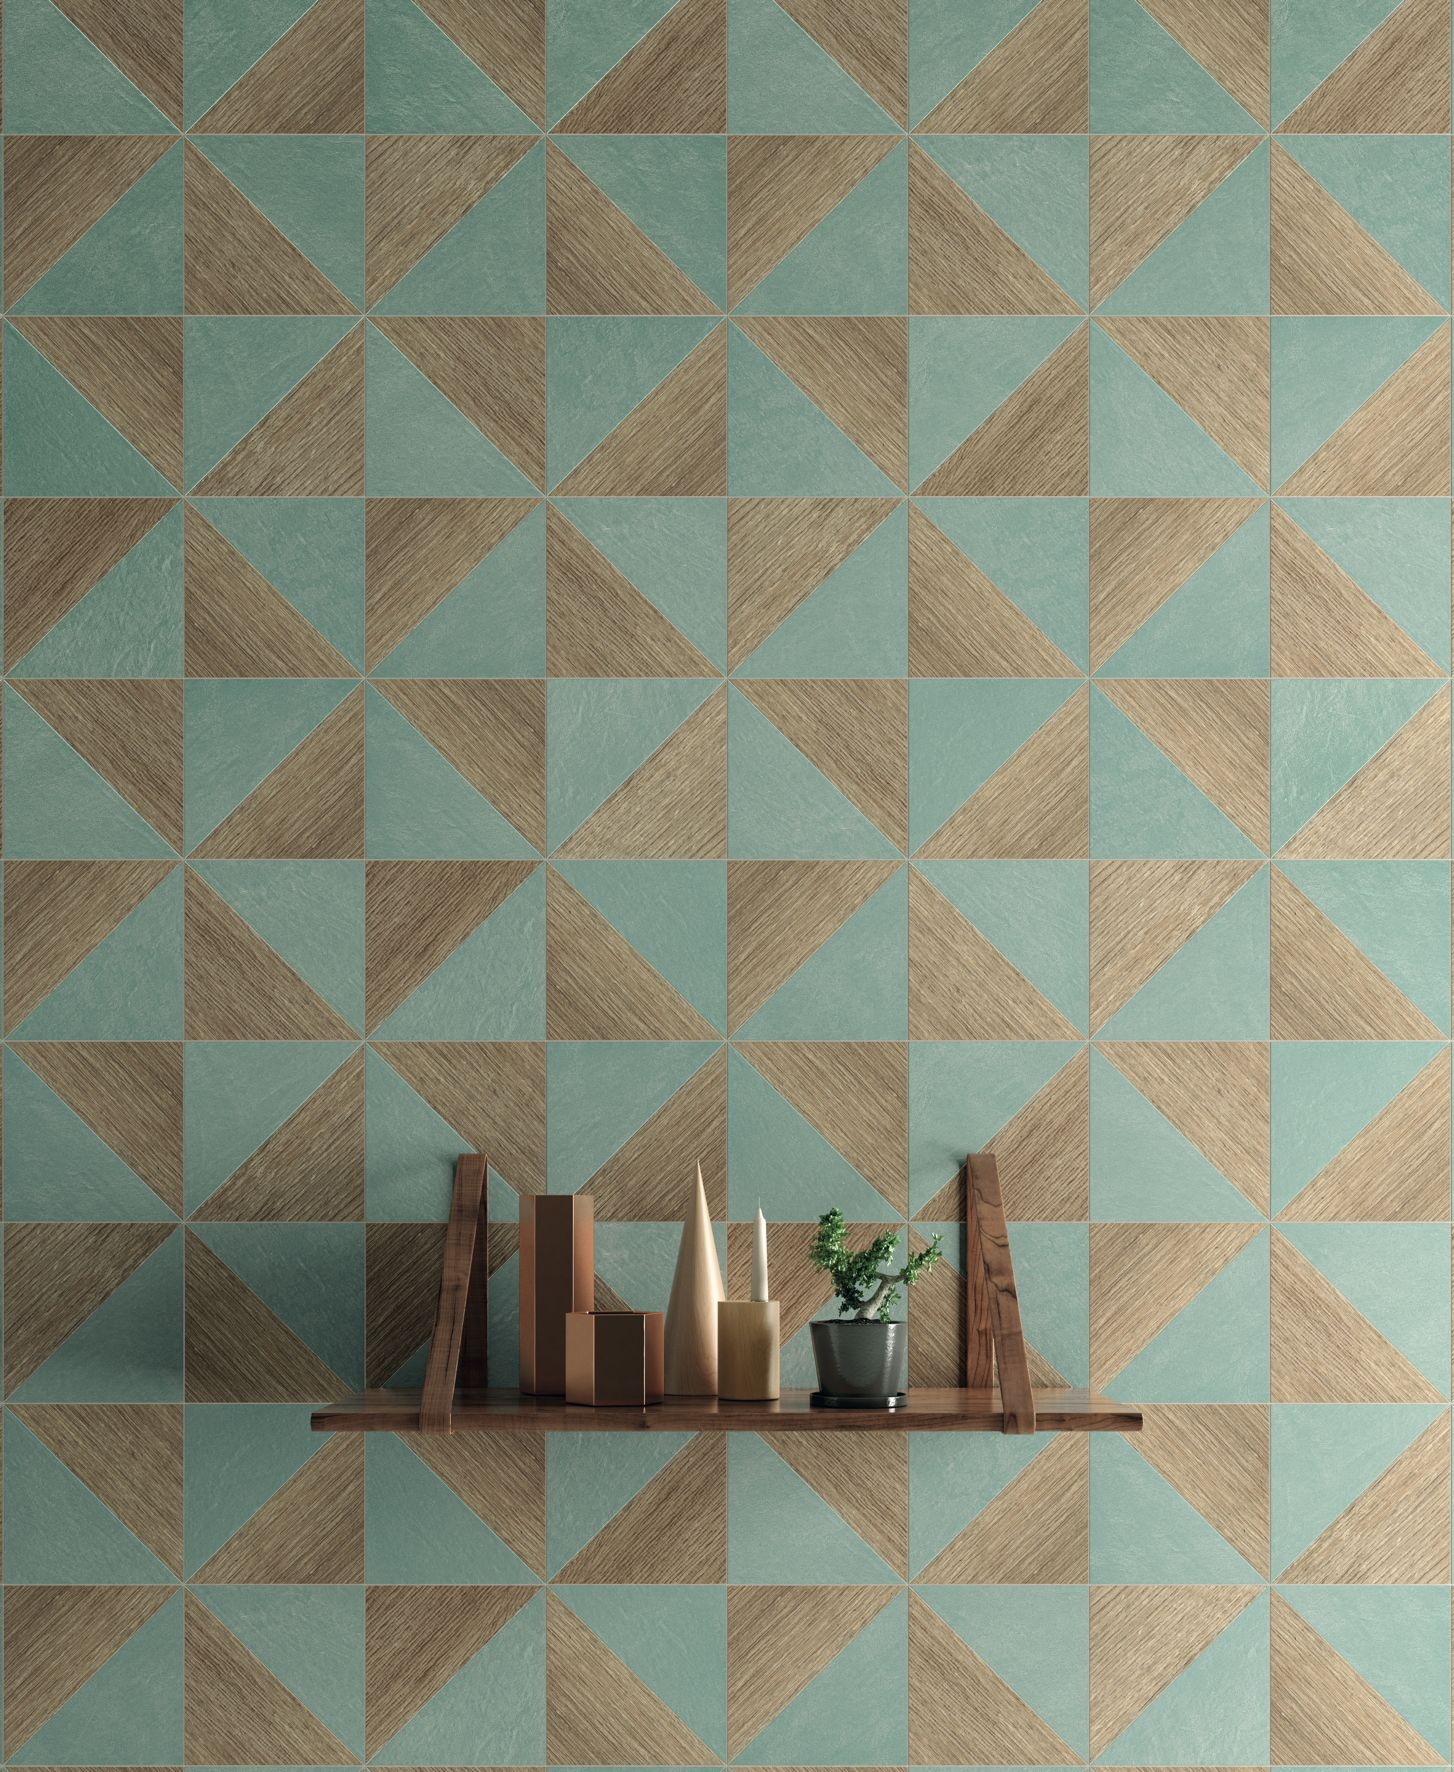 surface carrelage collection full gr s c rame surface carrelages sols. Black Bedroom Furniture Sets. Home Design Ideas